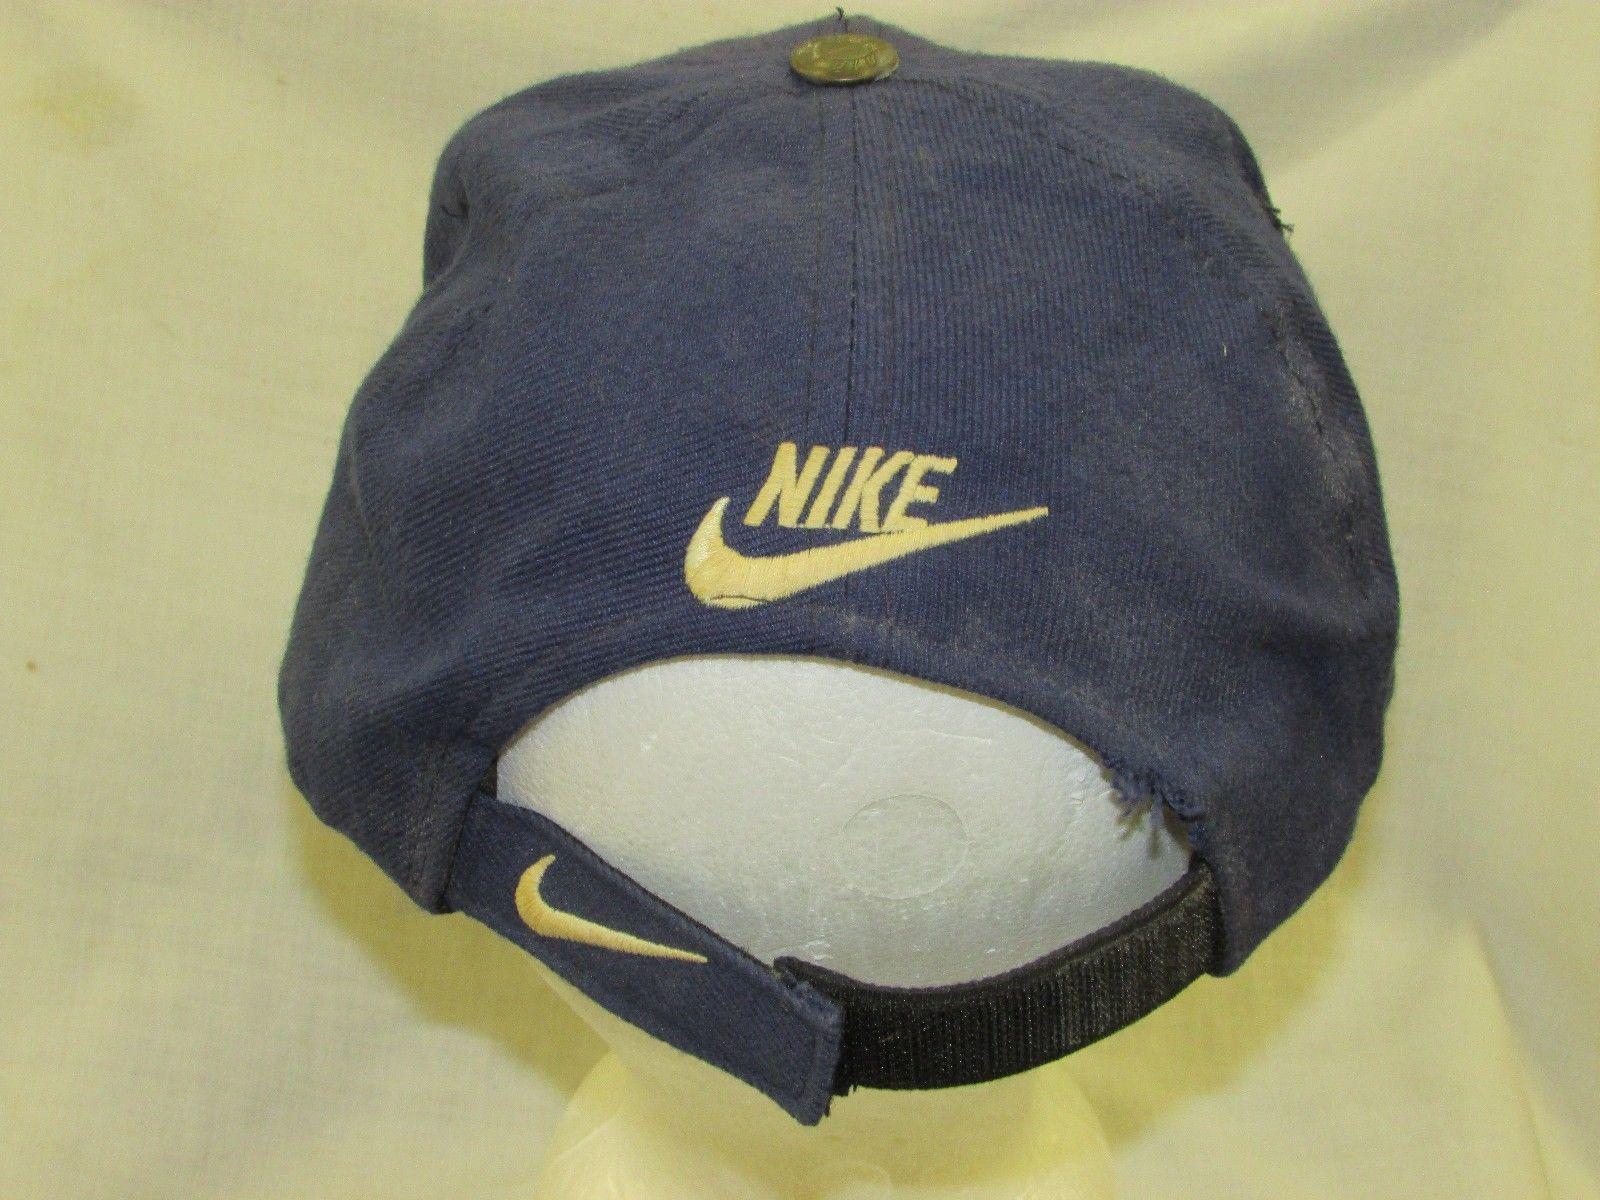 trucker hat baseball cap NIKE retro old style vintage unique rare curved brim